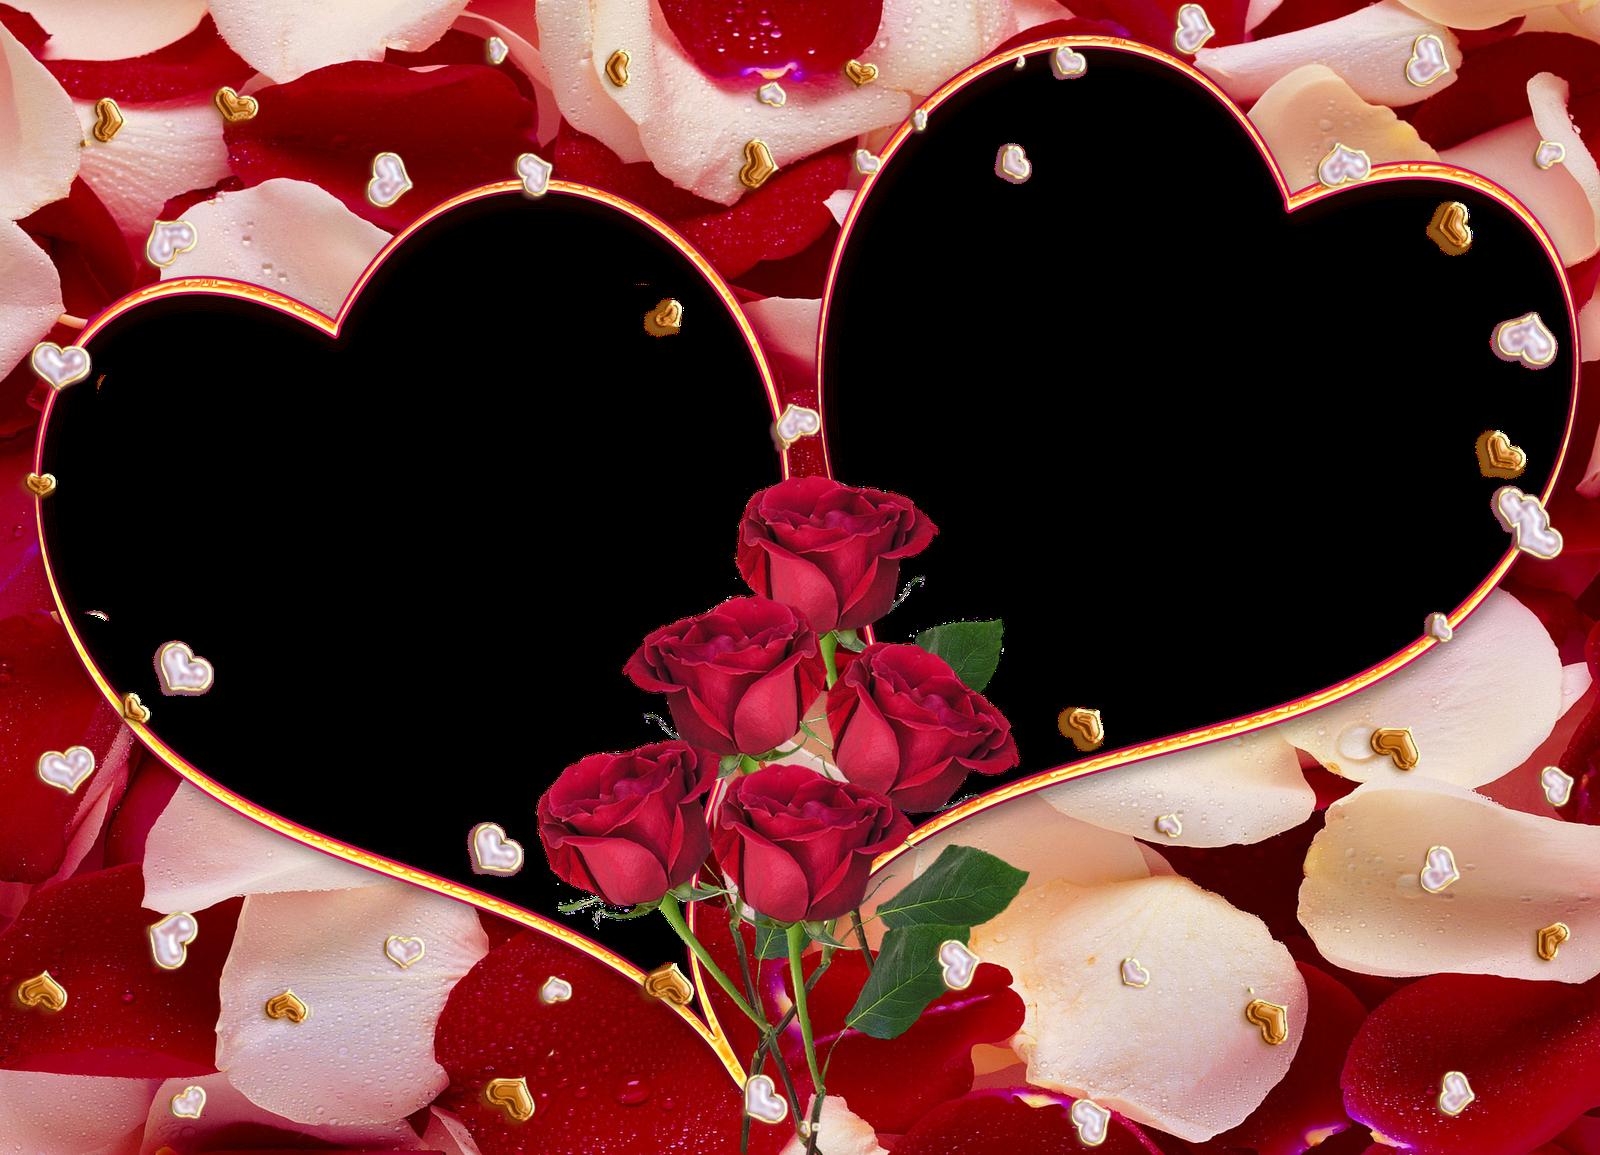 El Lenguaje universal: El Amor